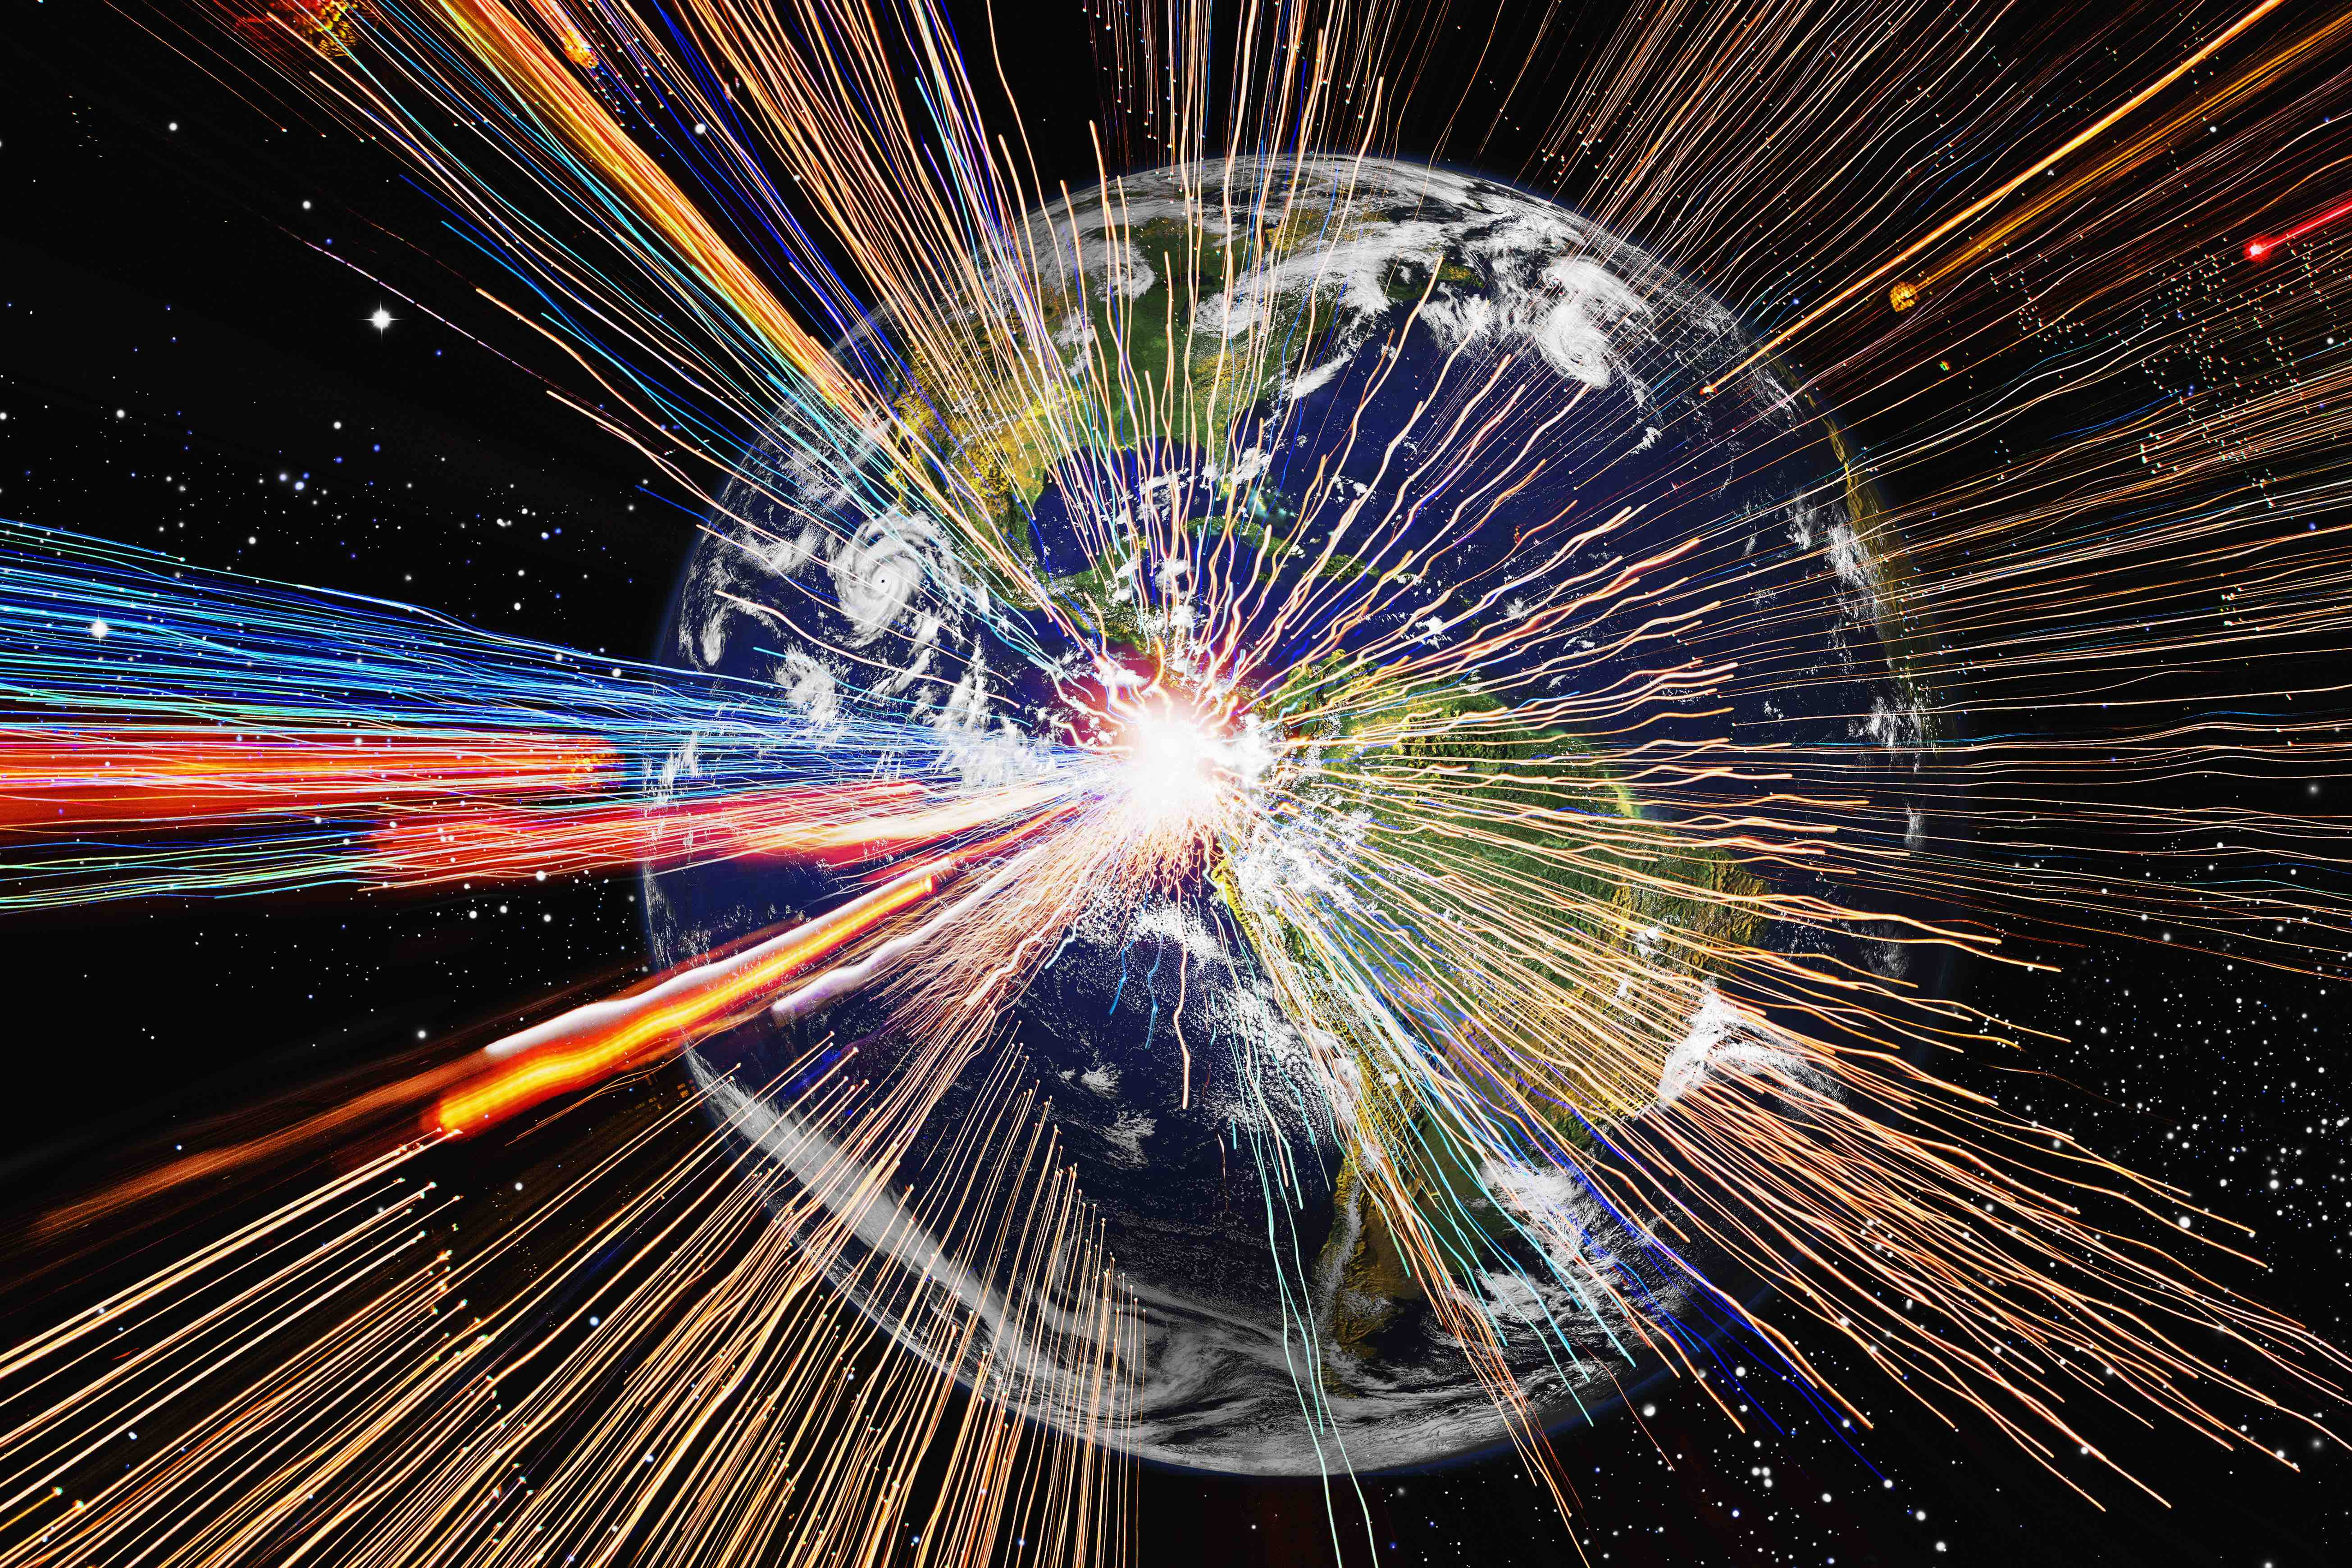 PwC Report: An Imaginative, Incisive Take on Four Future